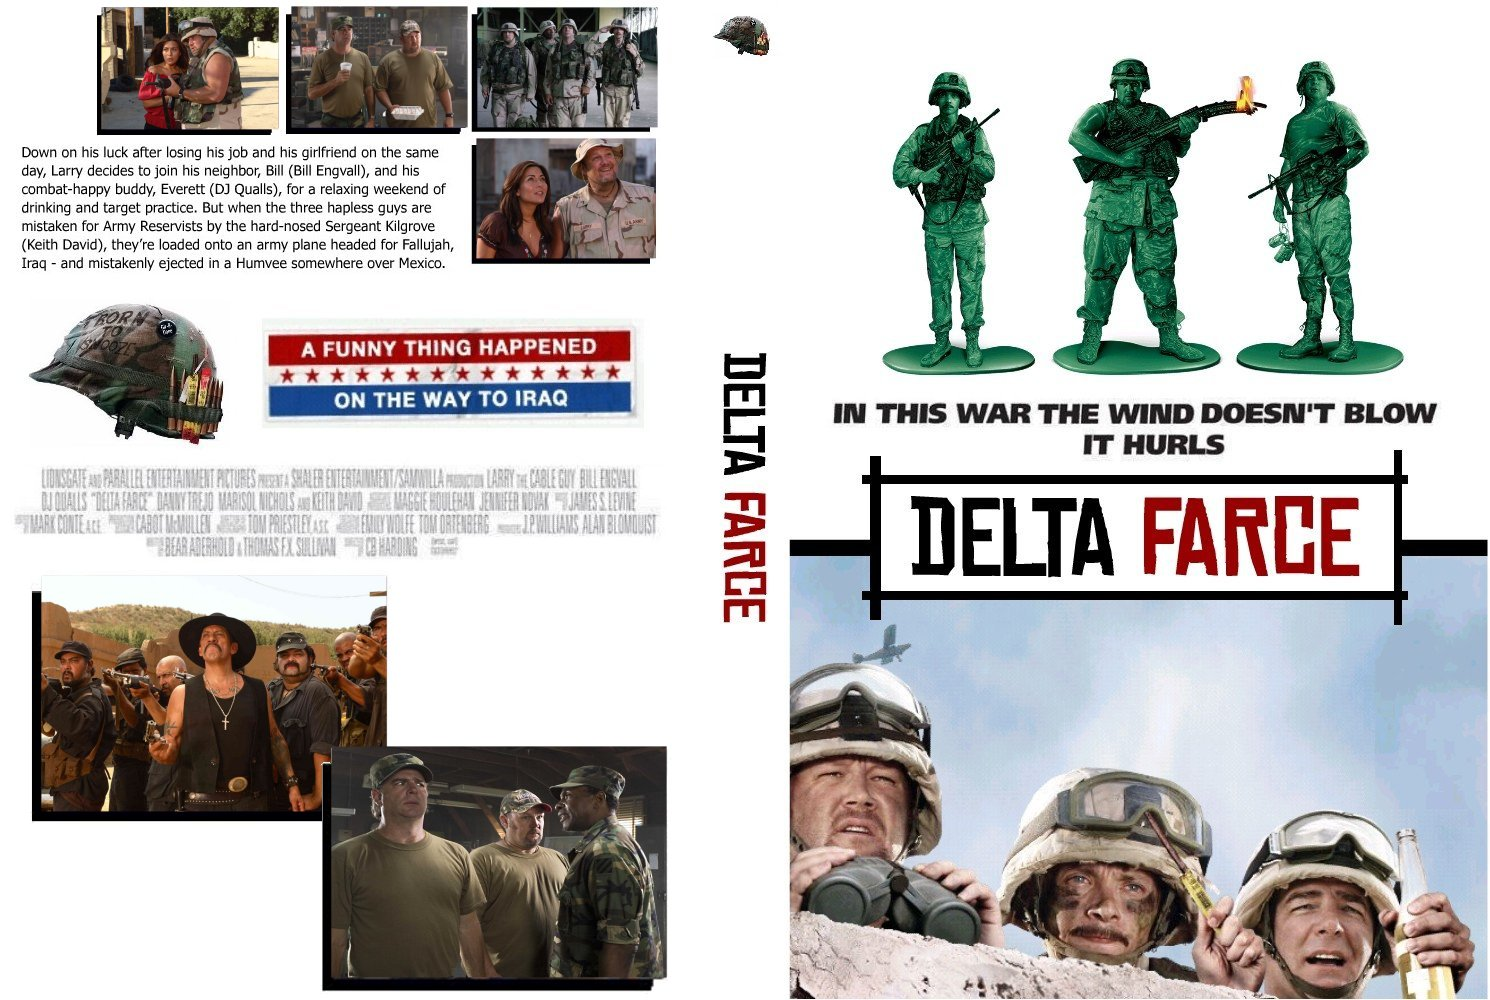 delta farce full movie download